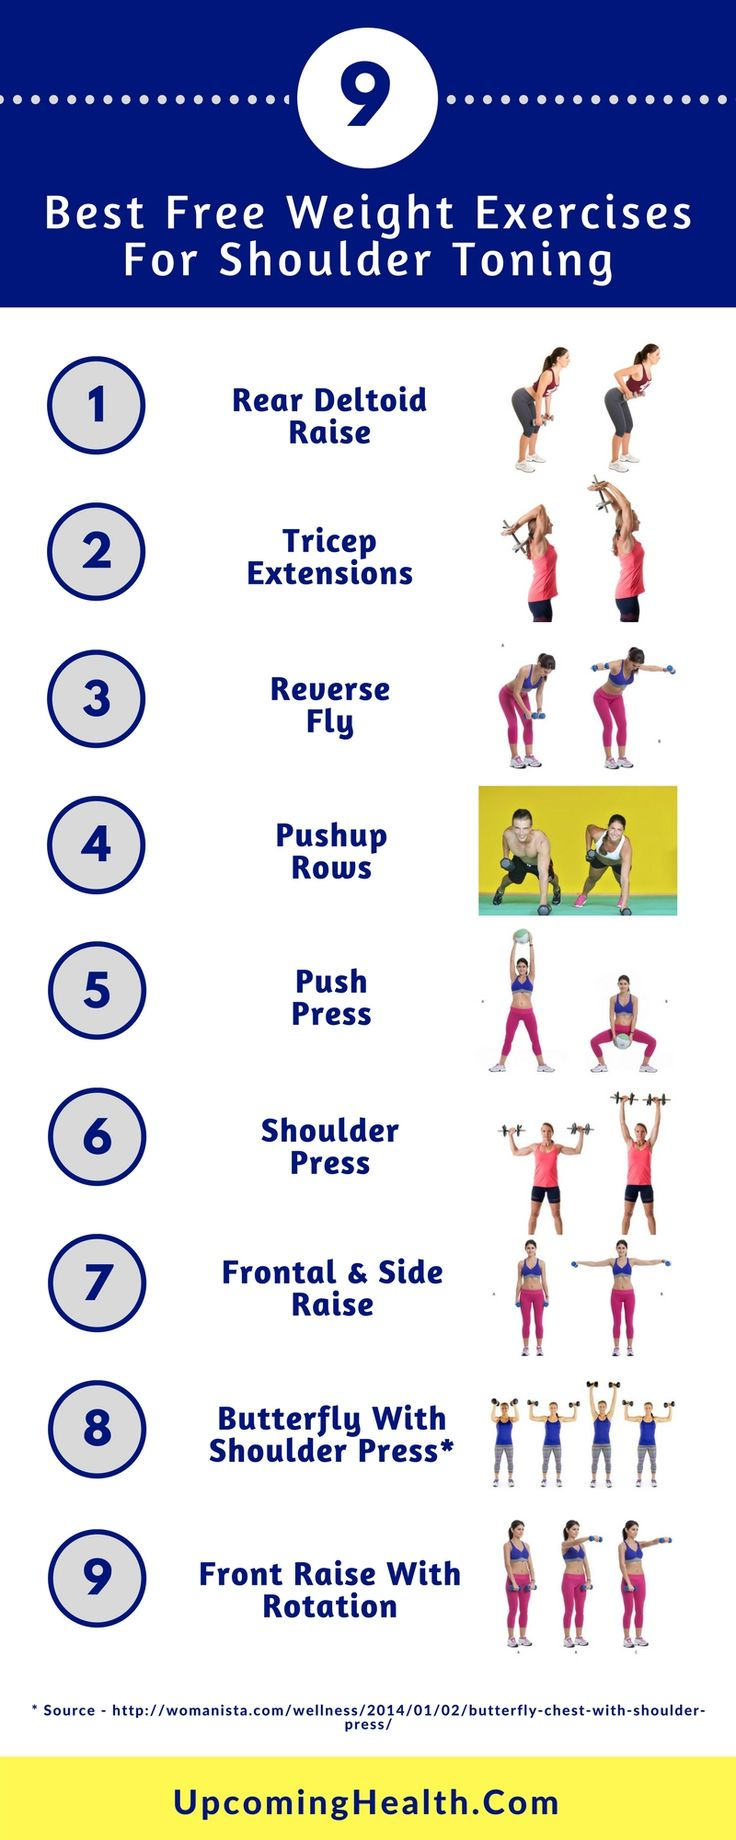 26 best Strengthen Upper Body While Healing Lower Body